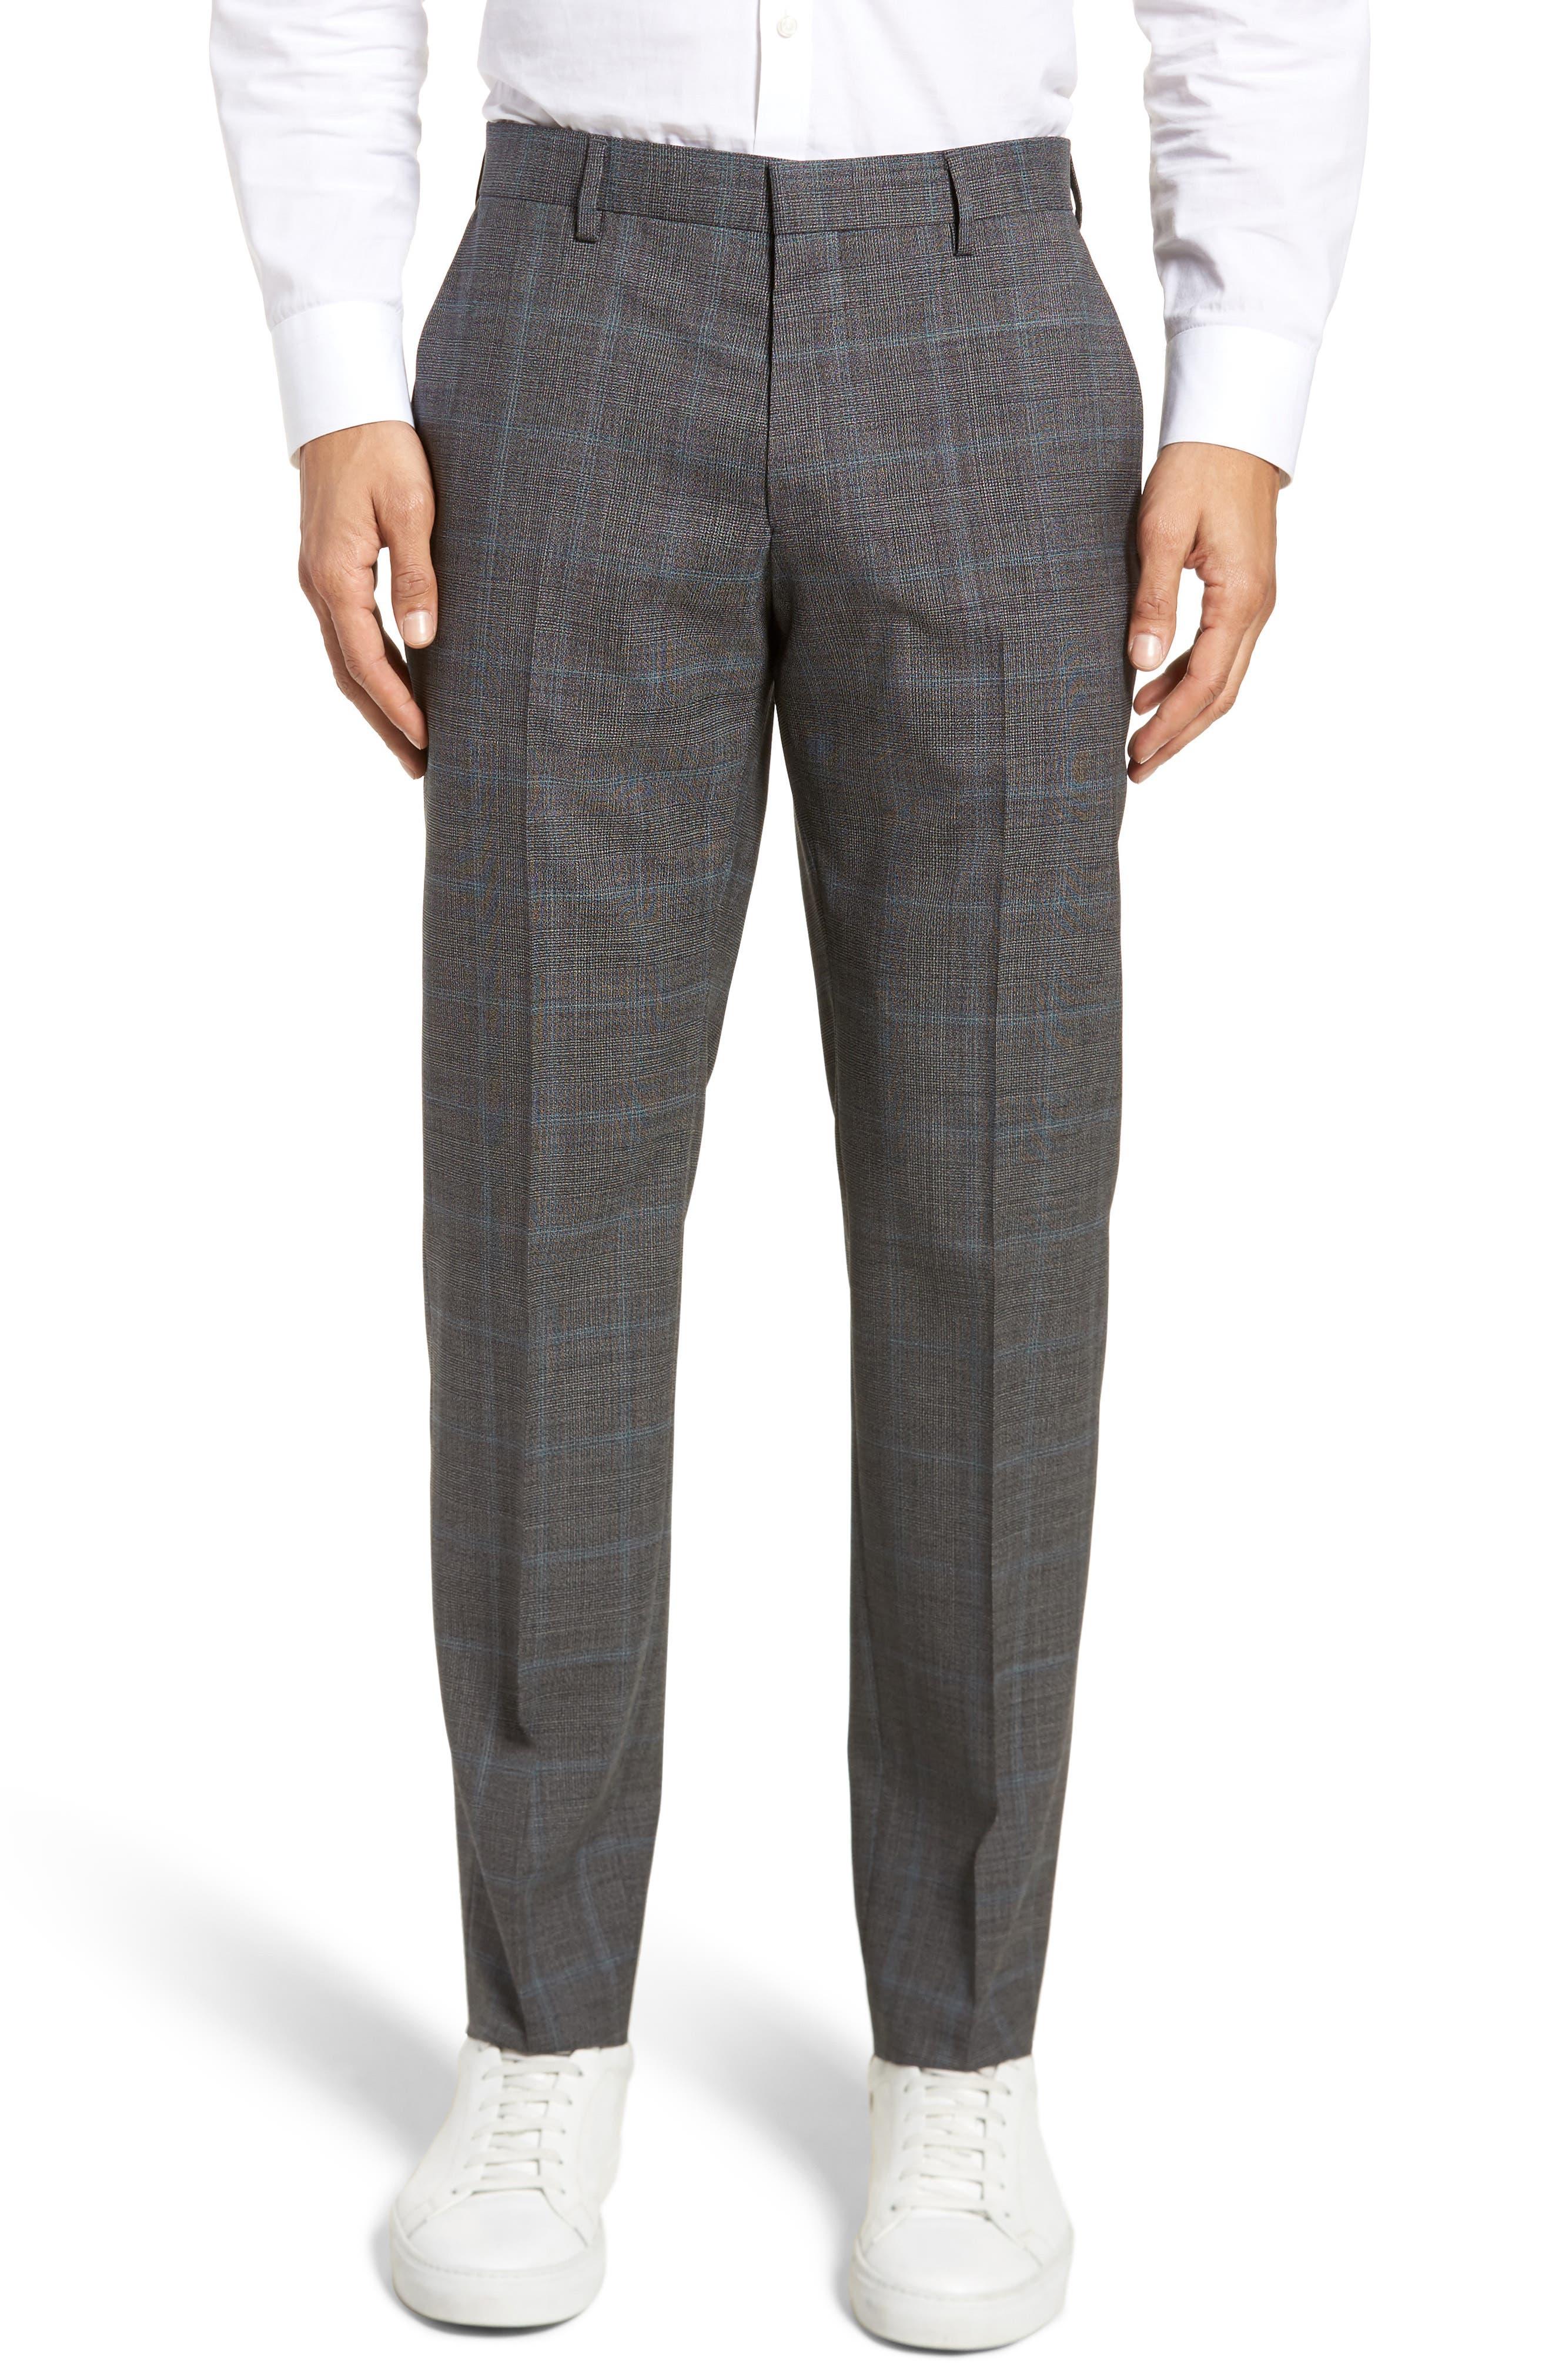 Genesis Flat Front Plaid Wool Trousers,                             Main thumbnail 1, color,                             061